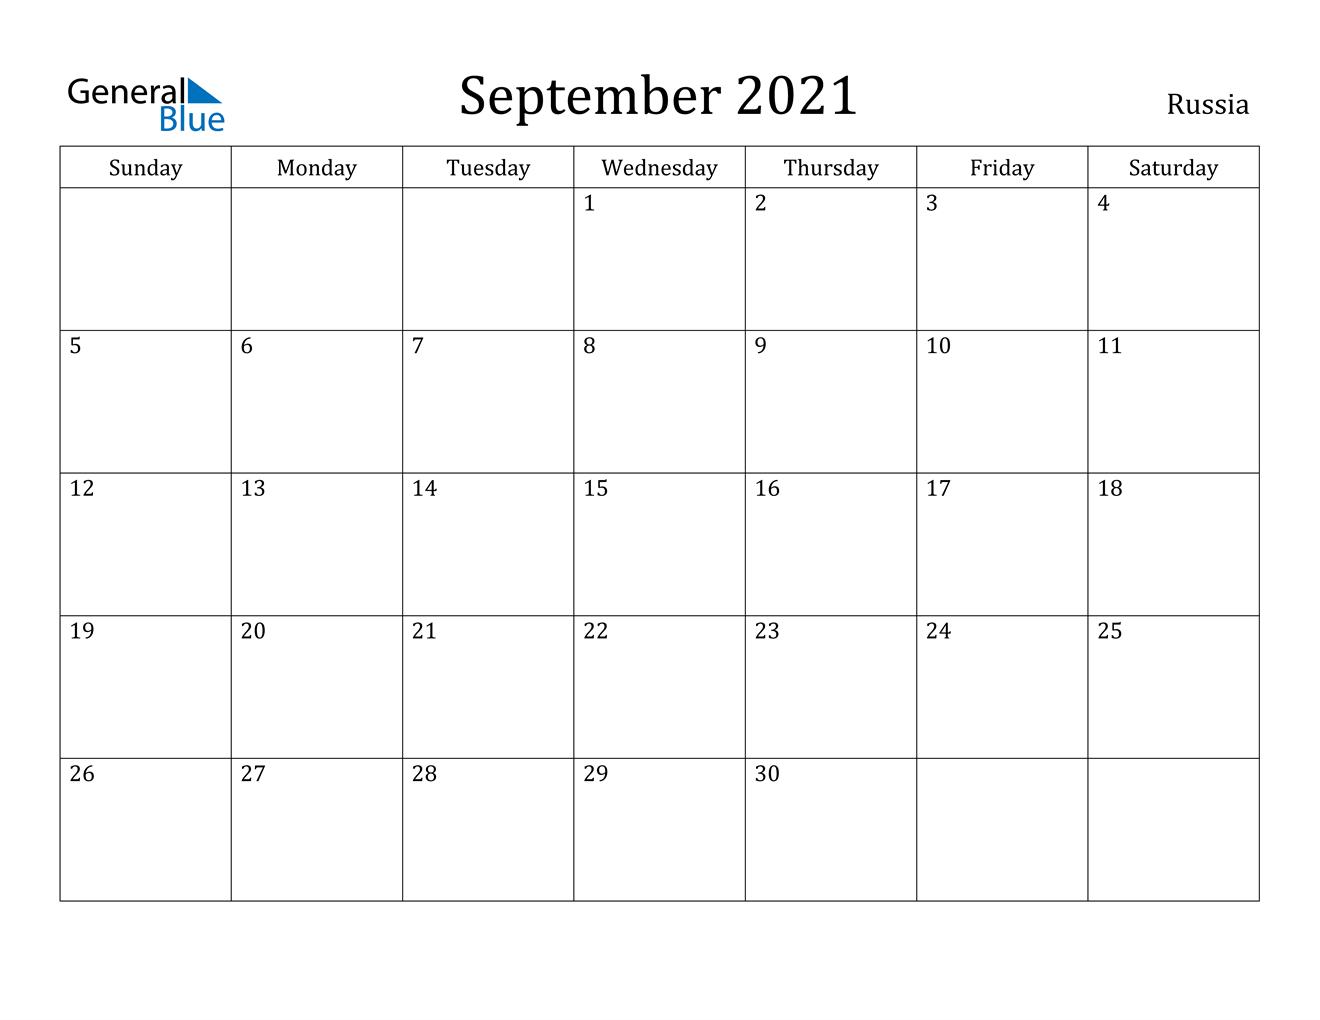 September 2021 Calendar - Russia